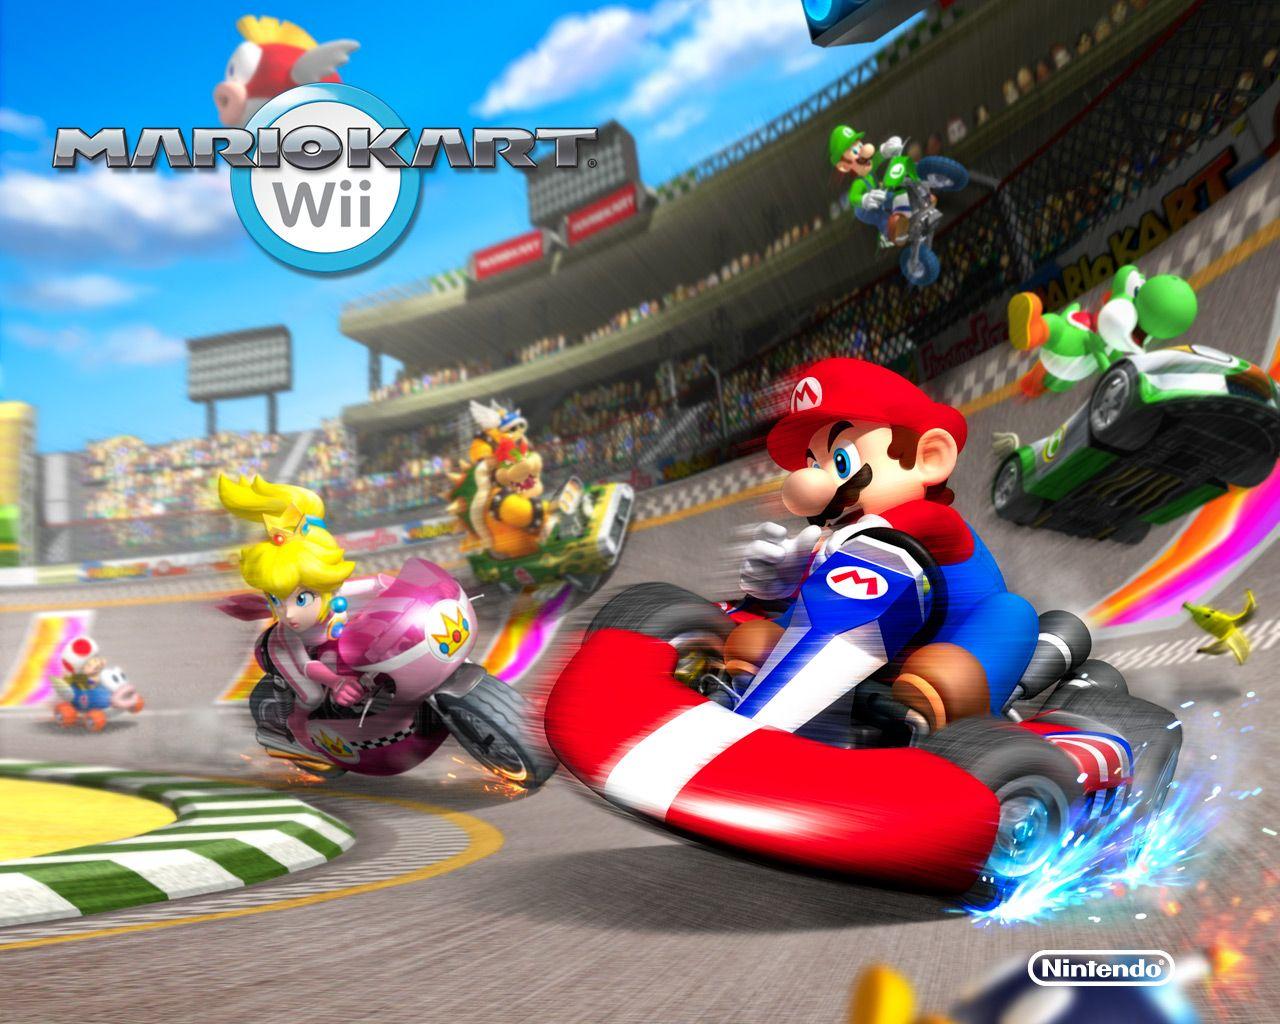 Donkey kong mario kart wii car tuning - Mario Kart Jogos Do Mario Kart 3d O Jogos Online